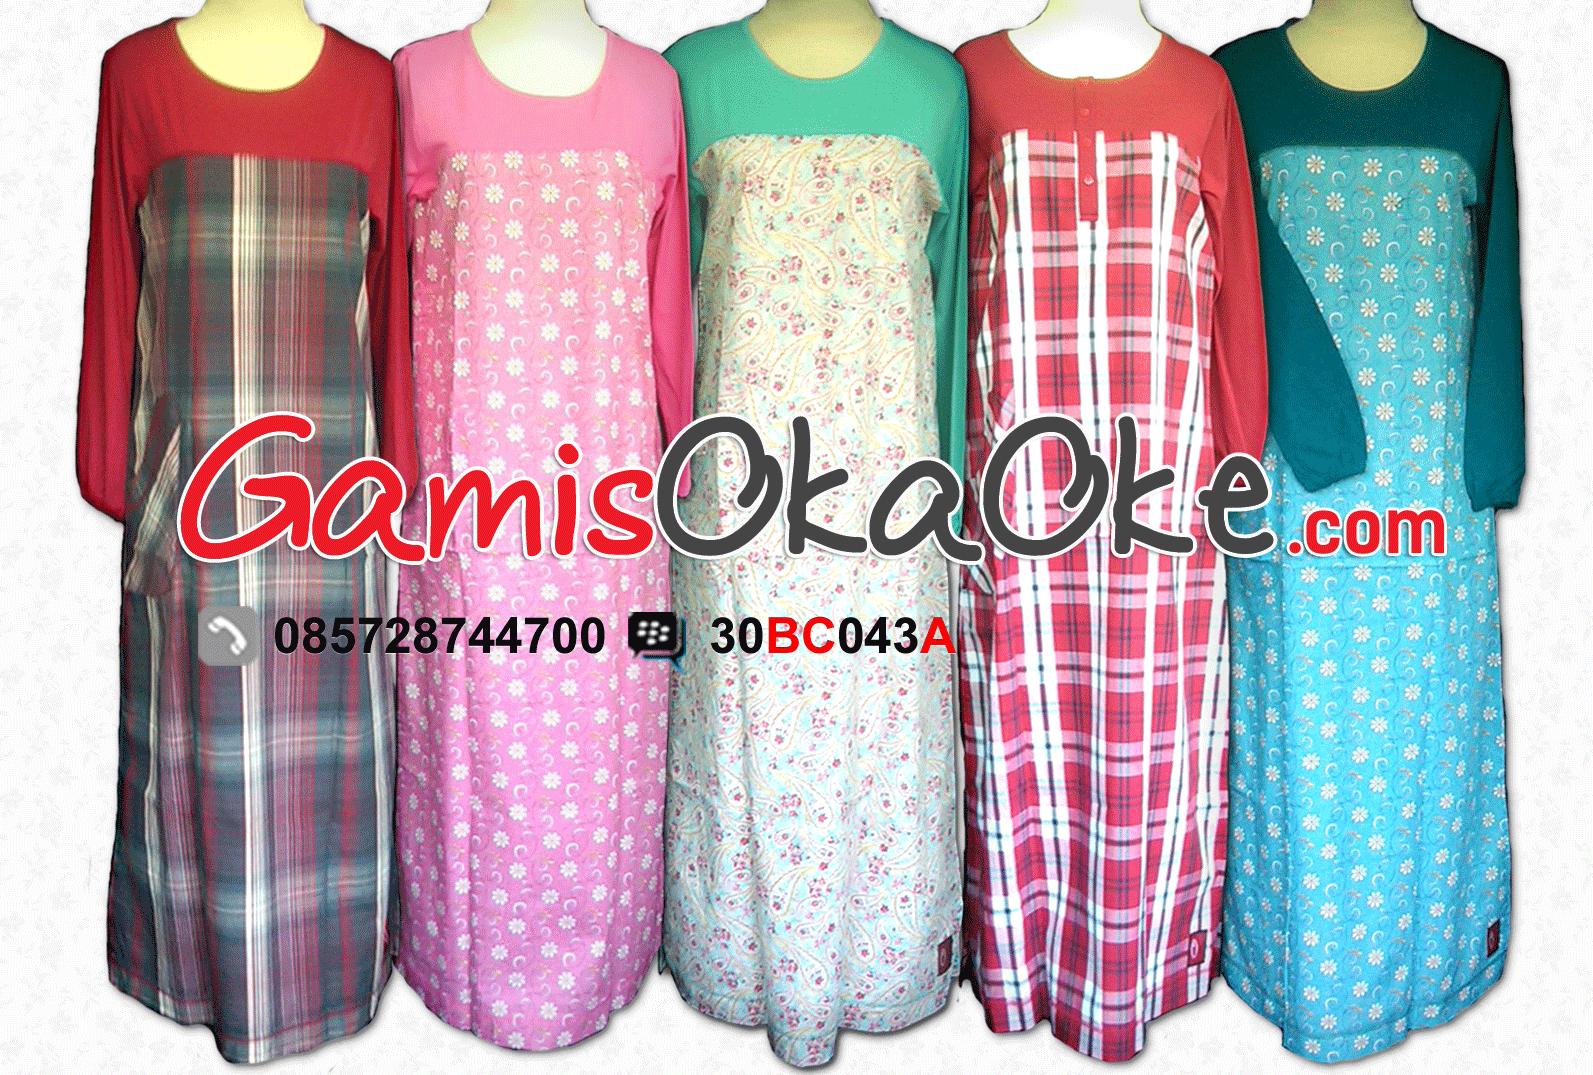 Gamis Oka Oke Dewasa Terbaru New Style For 2016 2017